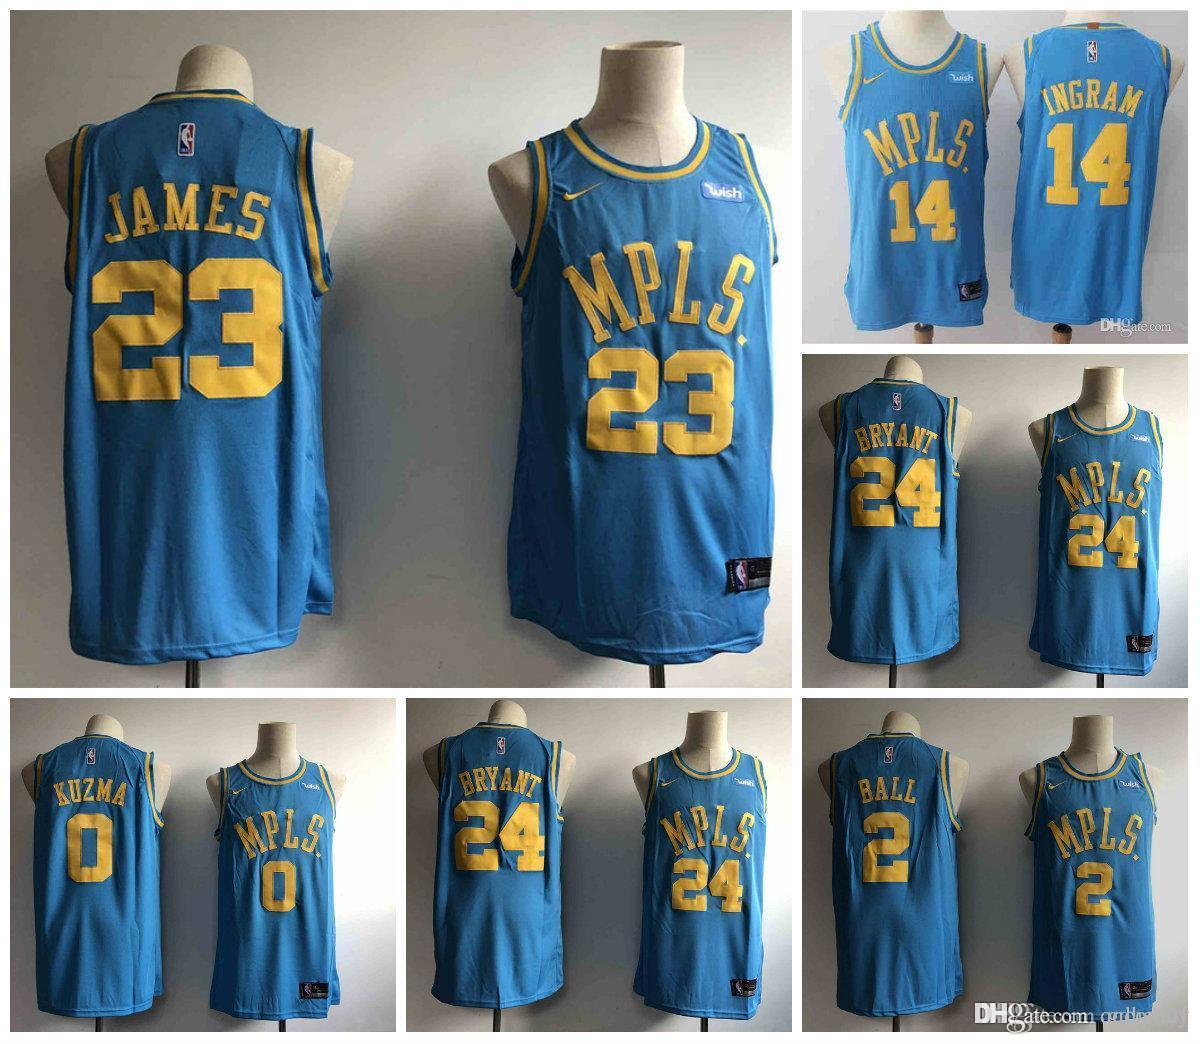 timeless design 0d98d b2018 23 LeBron James Laker Jersey The Citys Los Angeles Kobe 24 Lonzo 2 Ball  Kyle 0 Kuzma Brandon 14 Ingram Blue ball Jersey